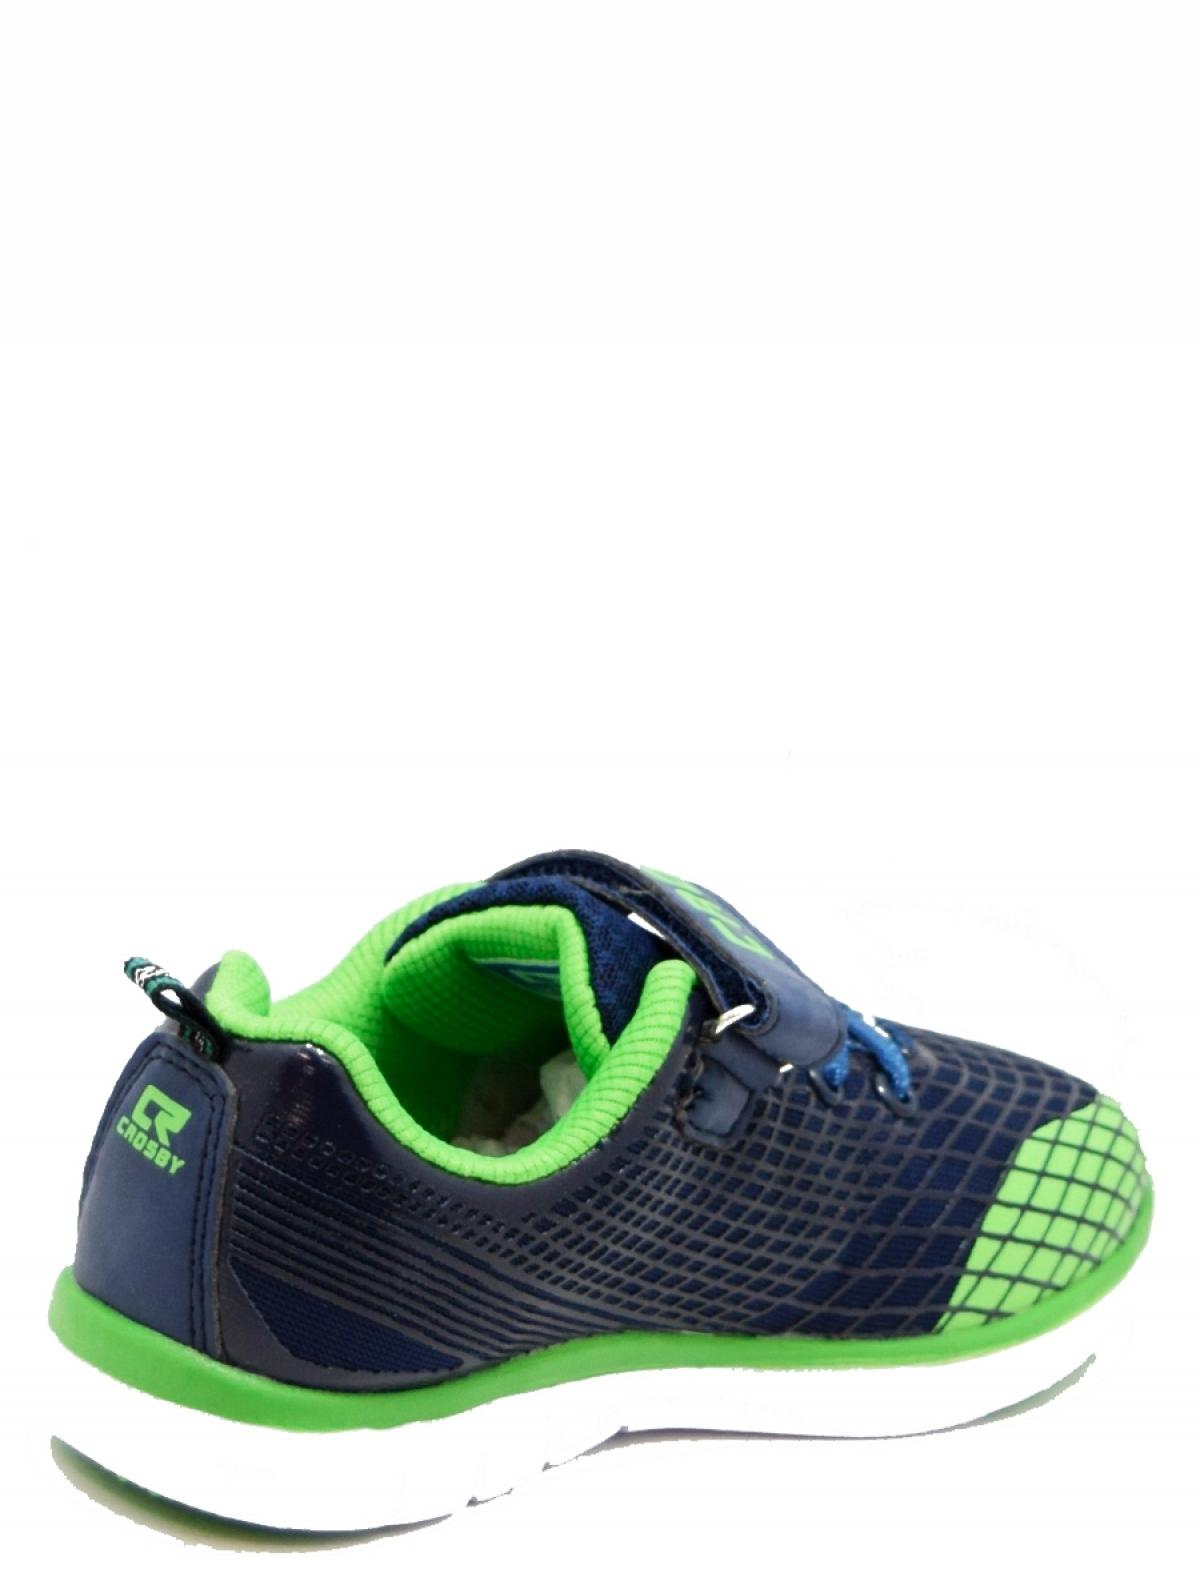 CROSBY 457070/01-02-K кроссовки для мальчика